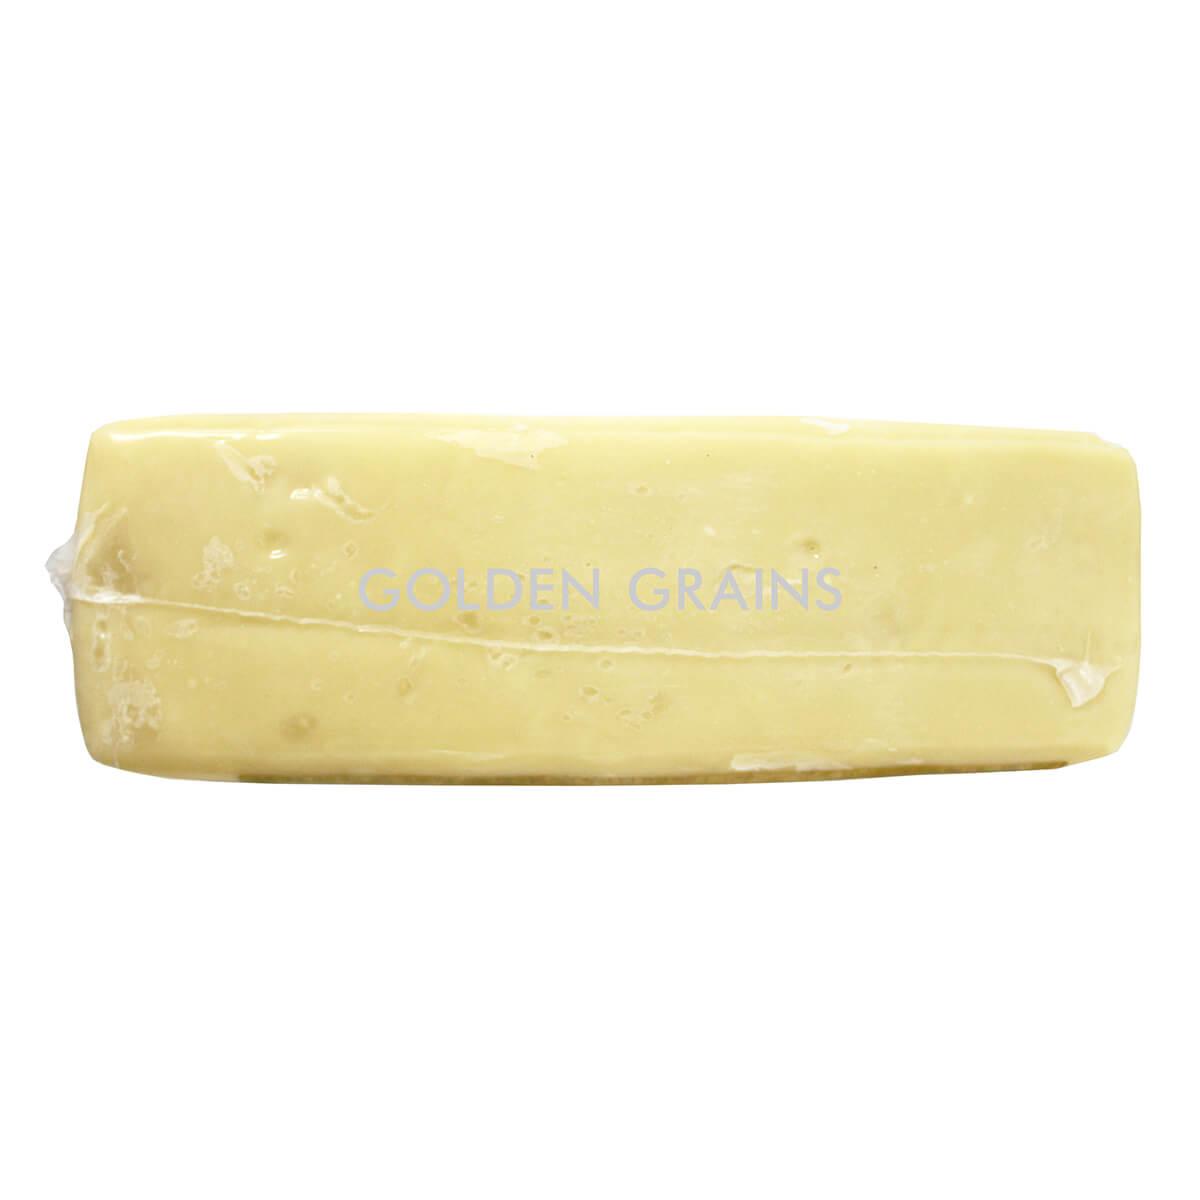 Golden Grains Dubai Export - Orino Cheese - Side.jpg